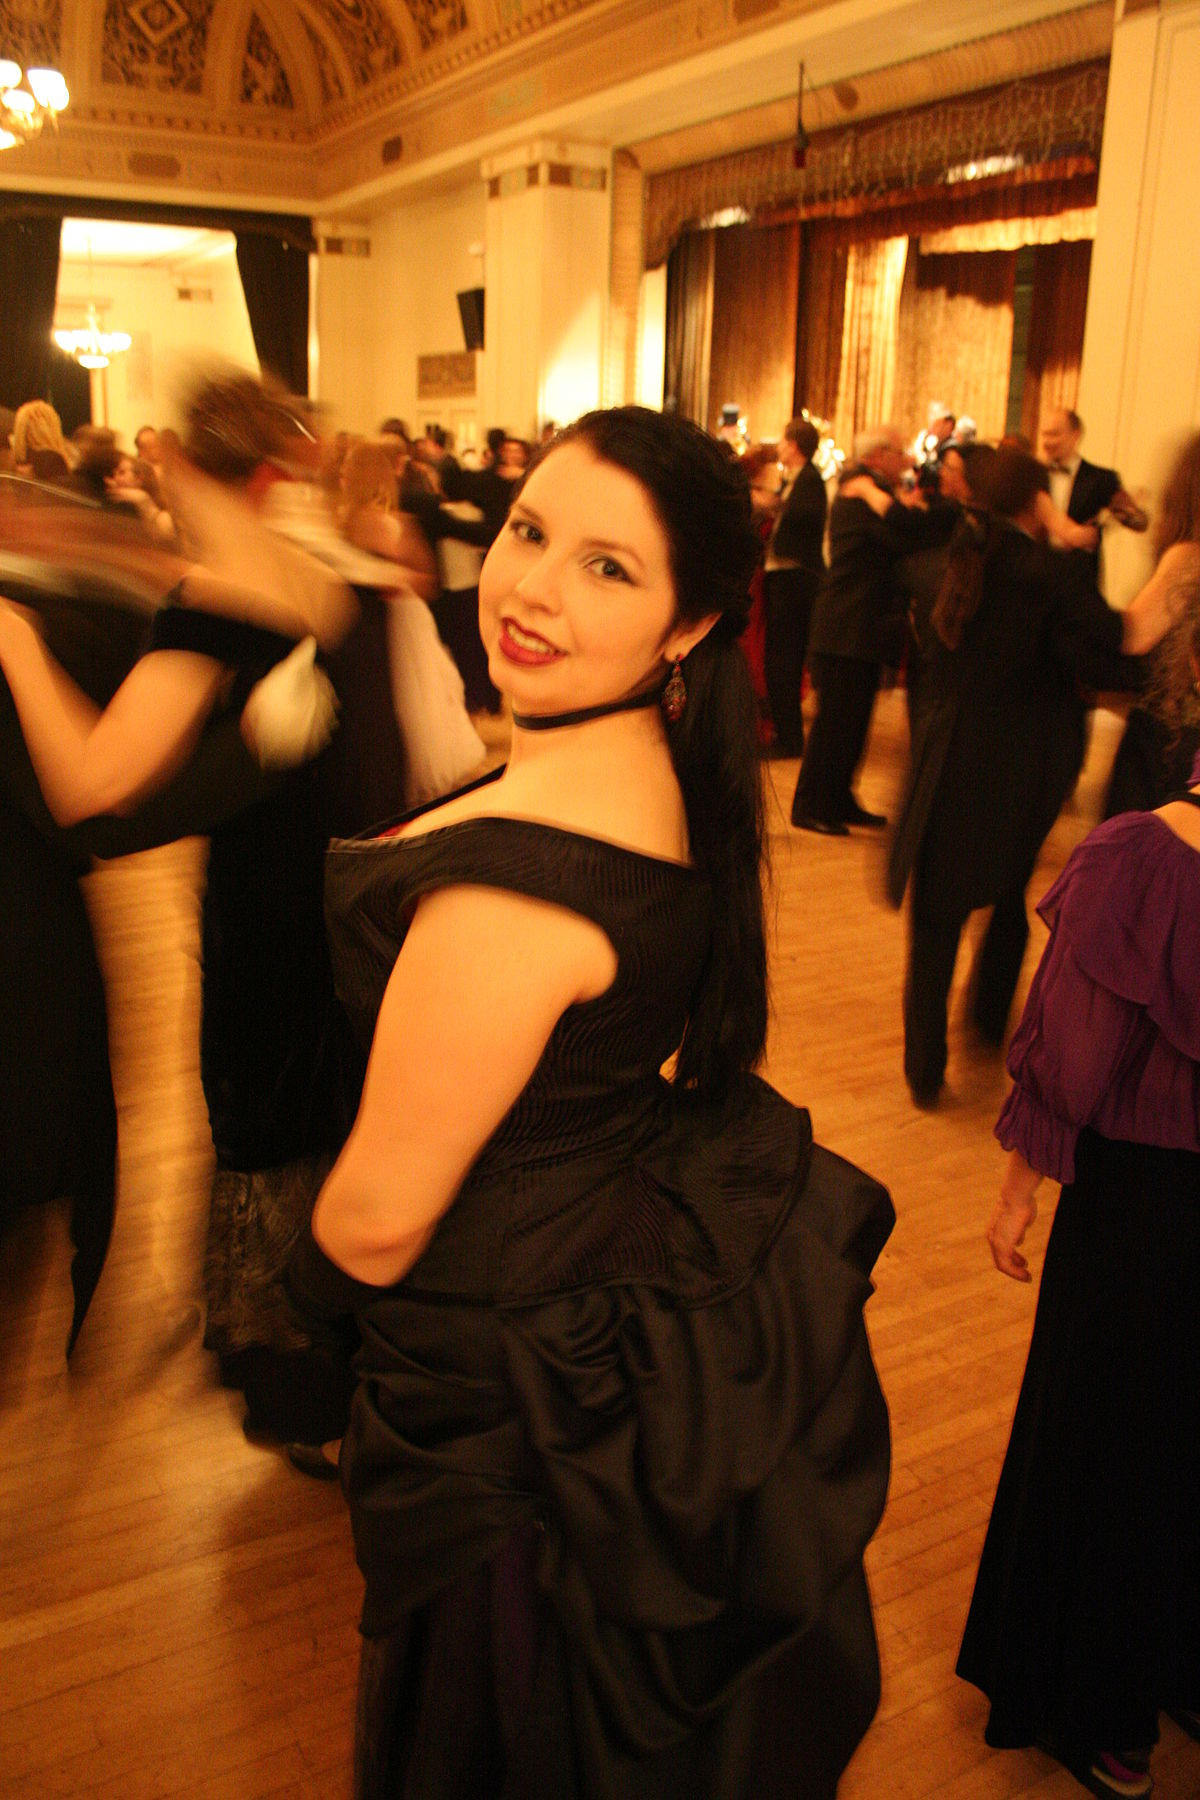 13 Genial Gala Abend Bekleidung GalerieAbend Großartig Gala Abend Bekleidung Stylish